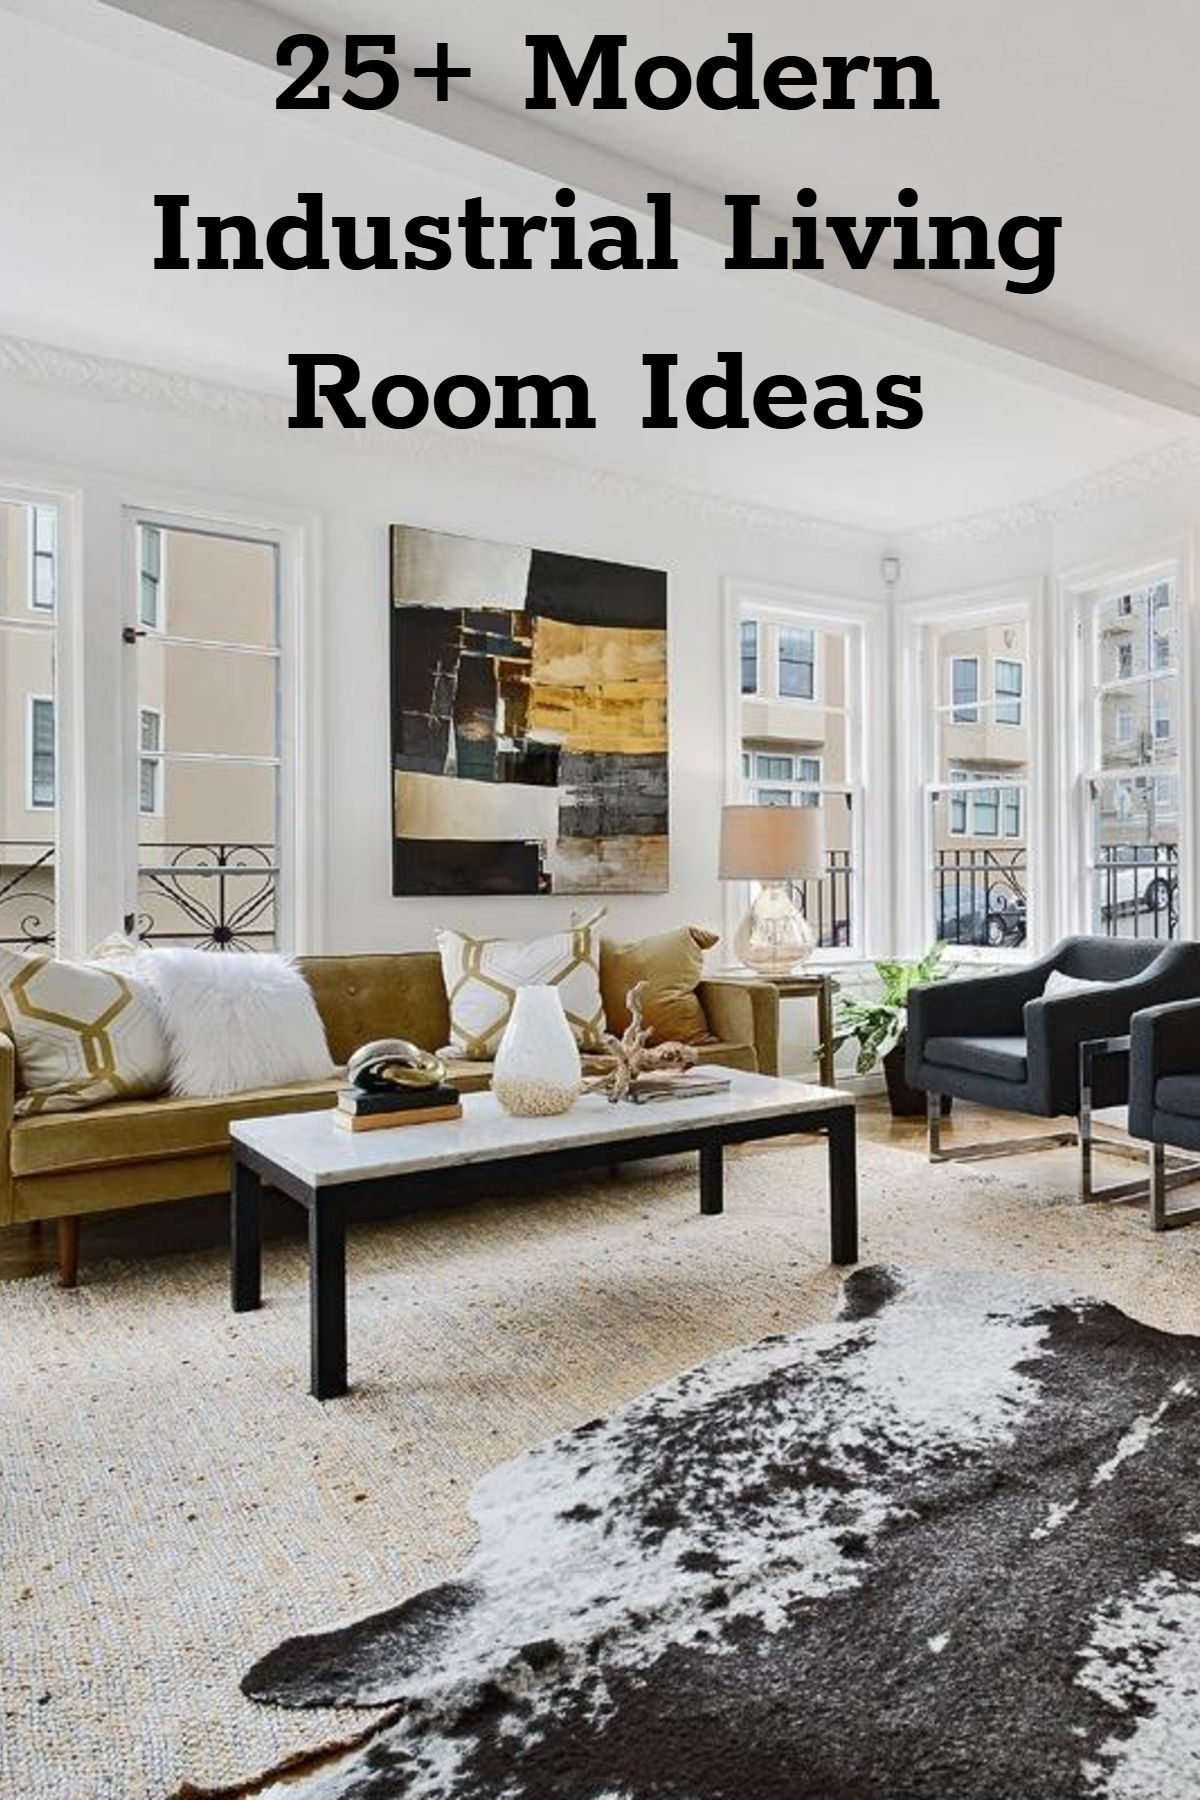 51 Industrial Living Room Decor Ideas Modern Industrial Living